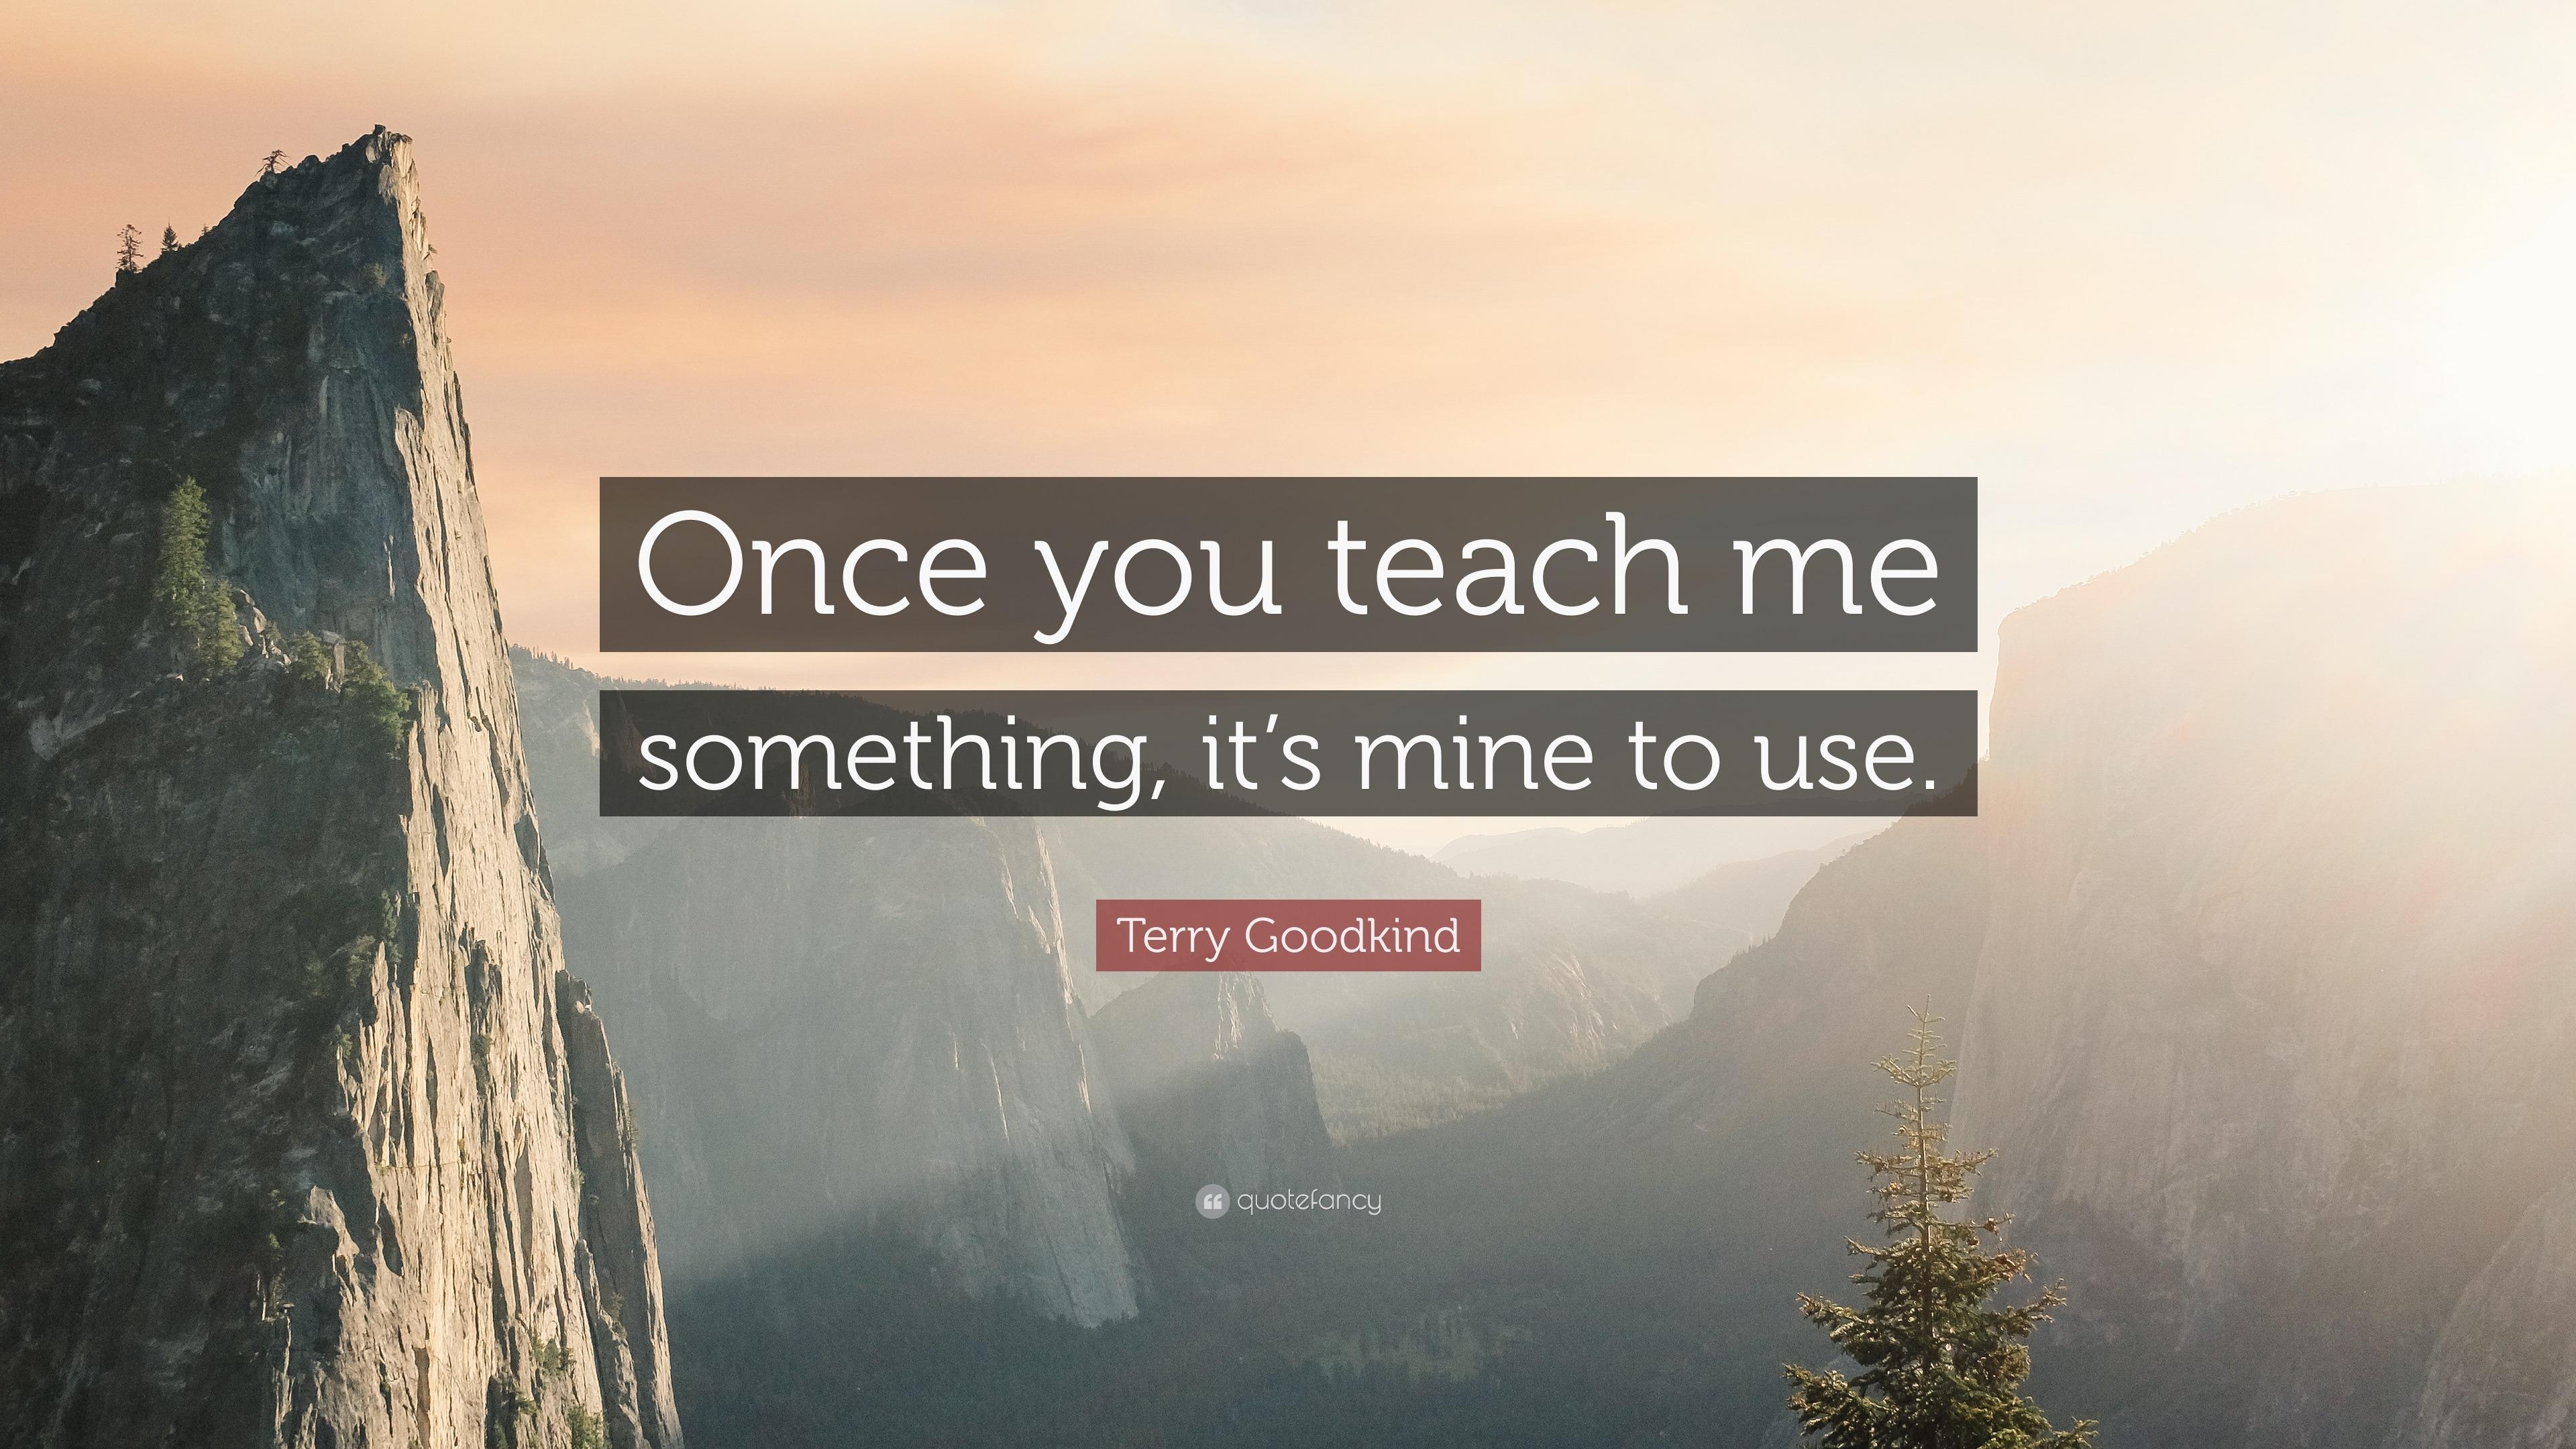 Returning Something Teach Me